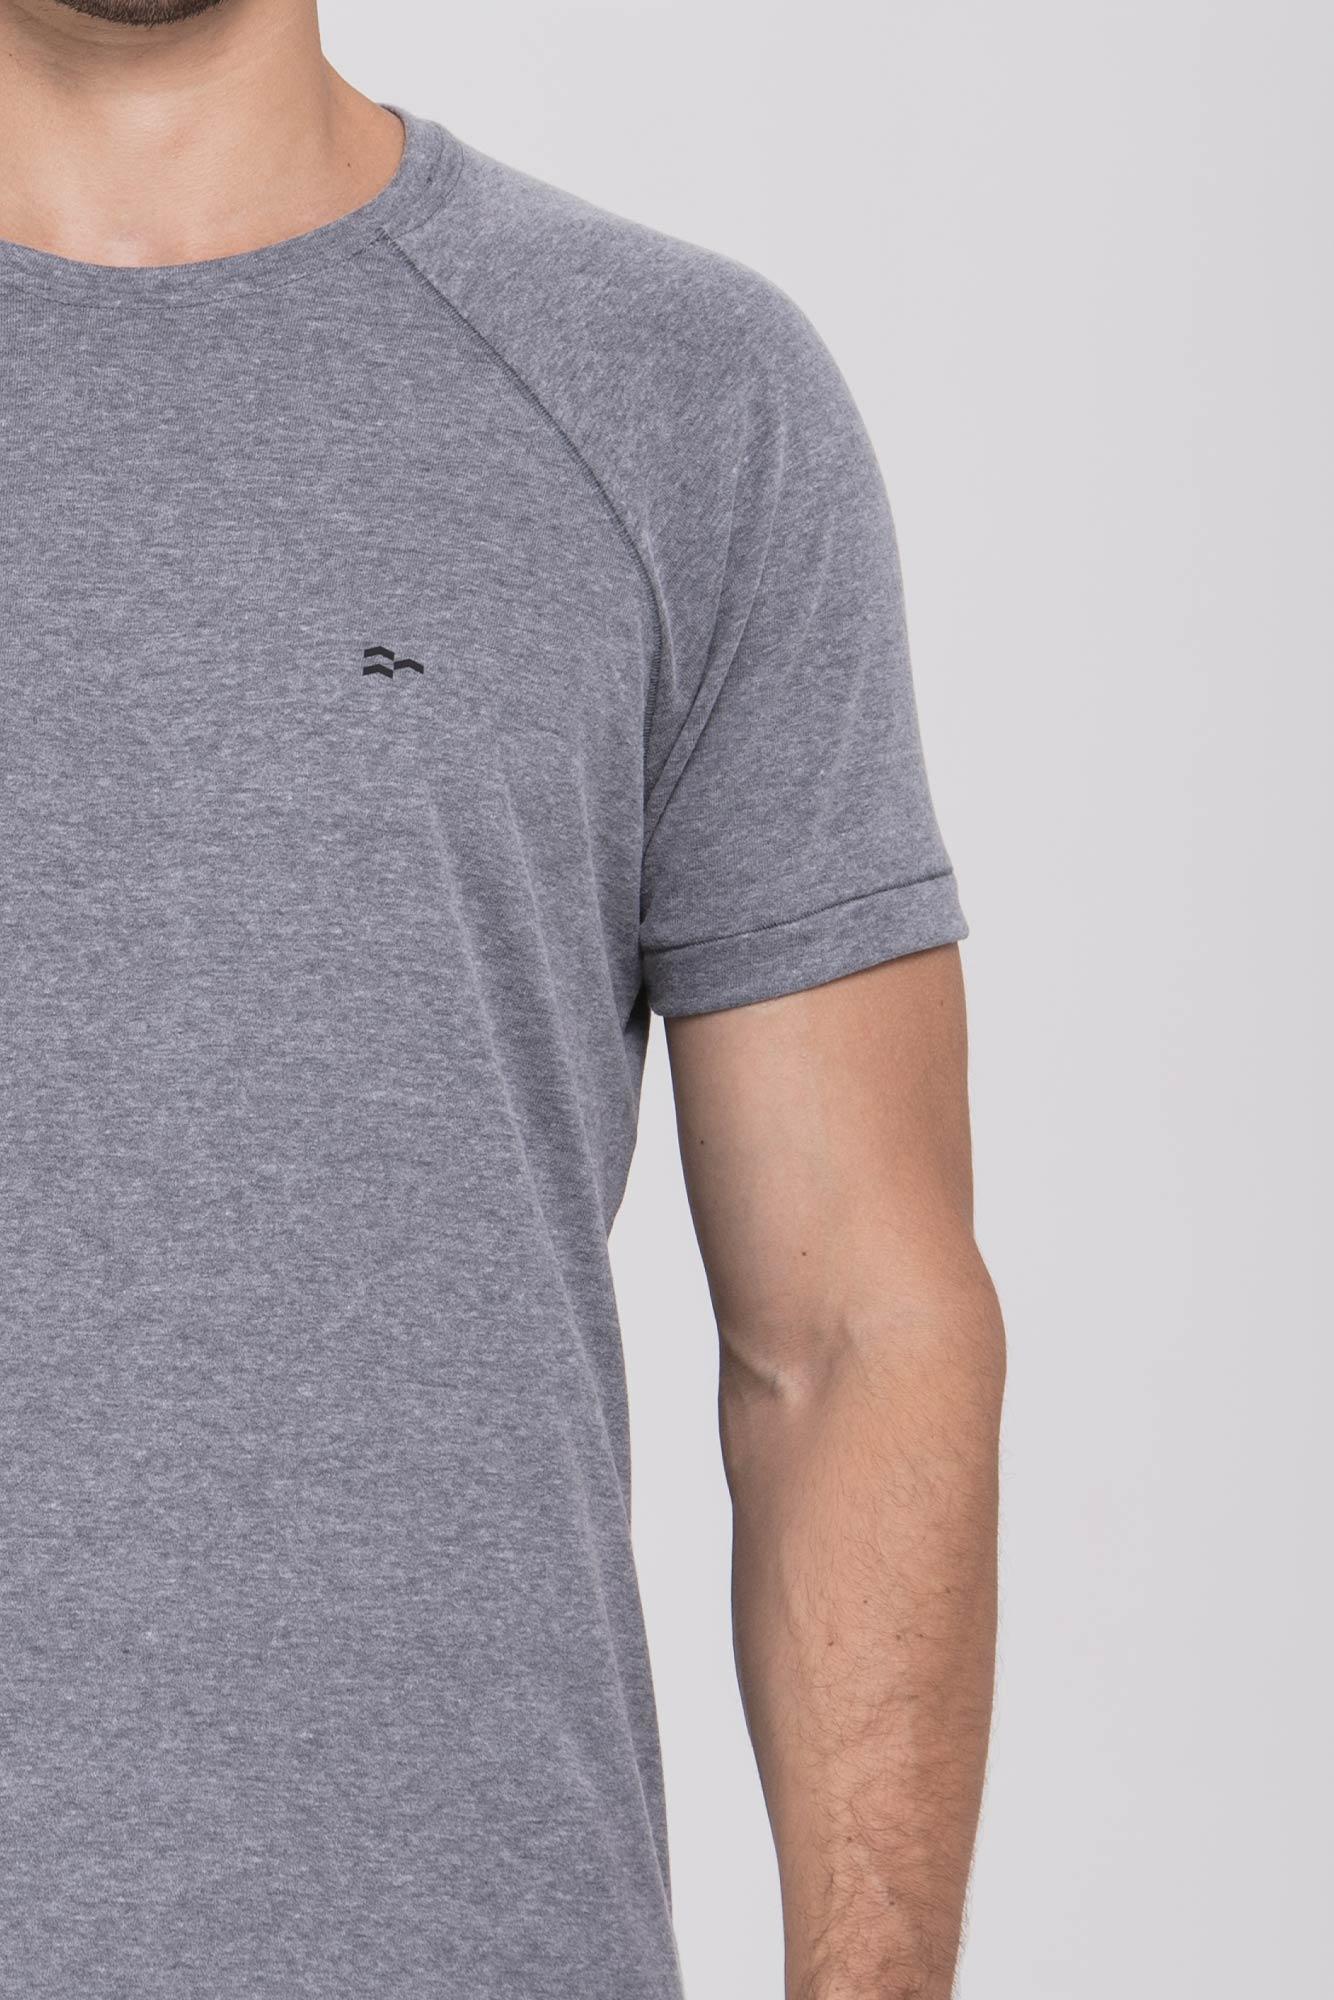 Camiseta Basic Vellutato Cinza